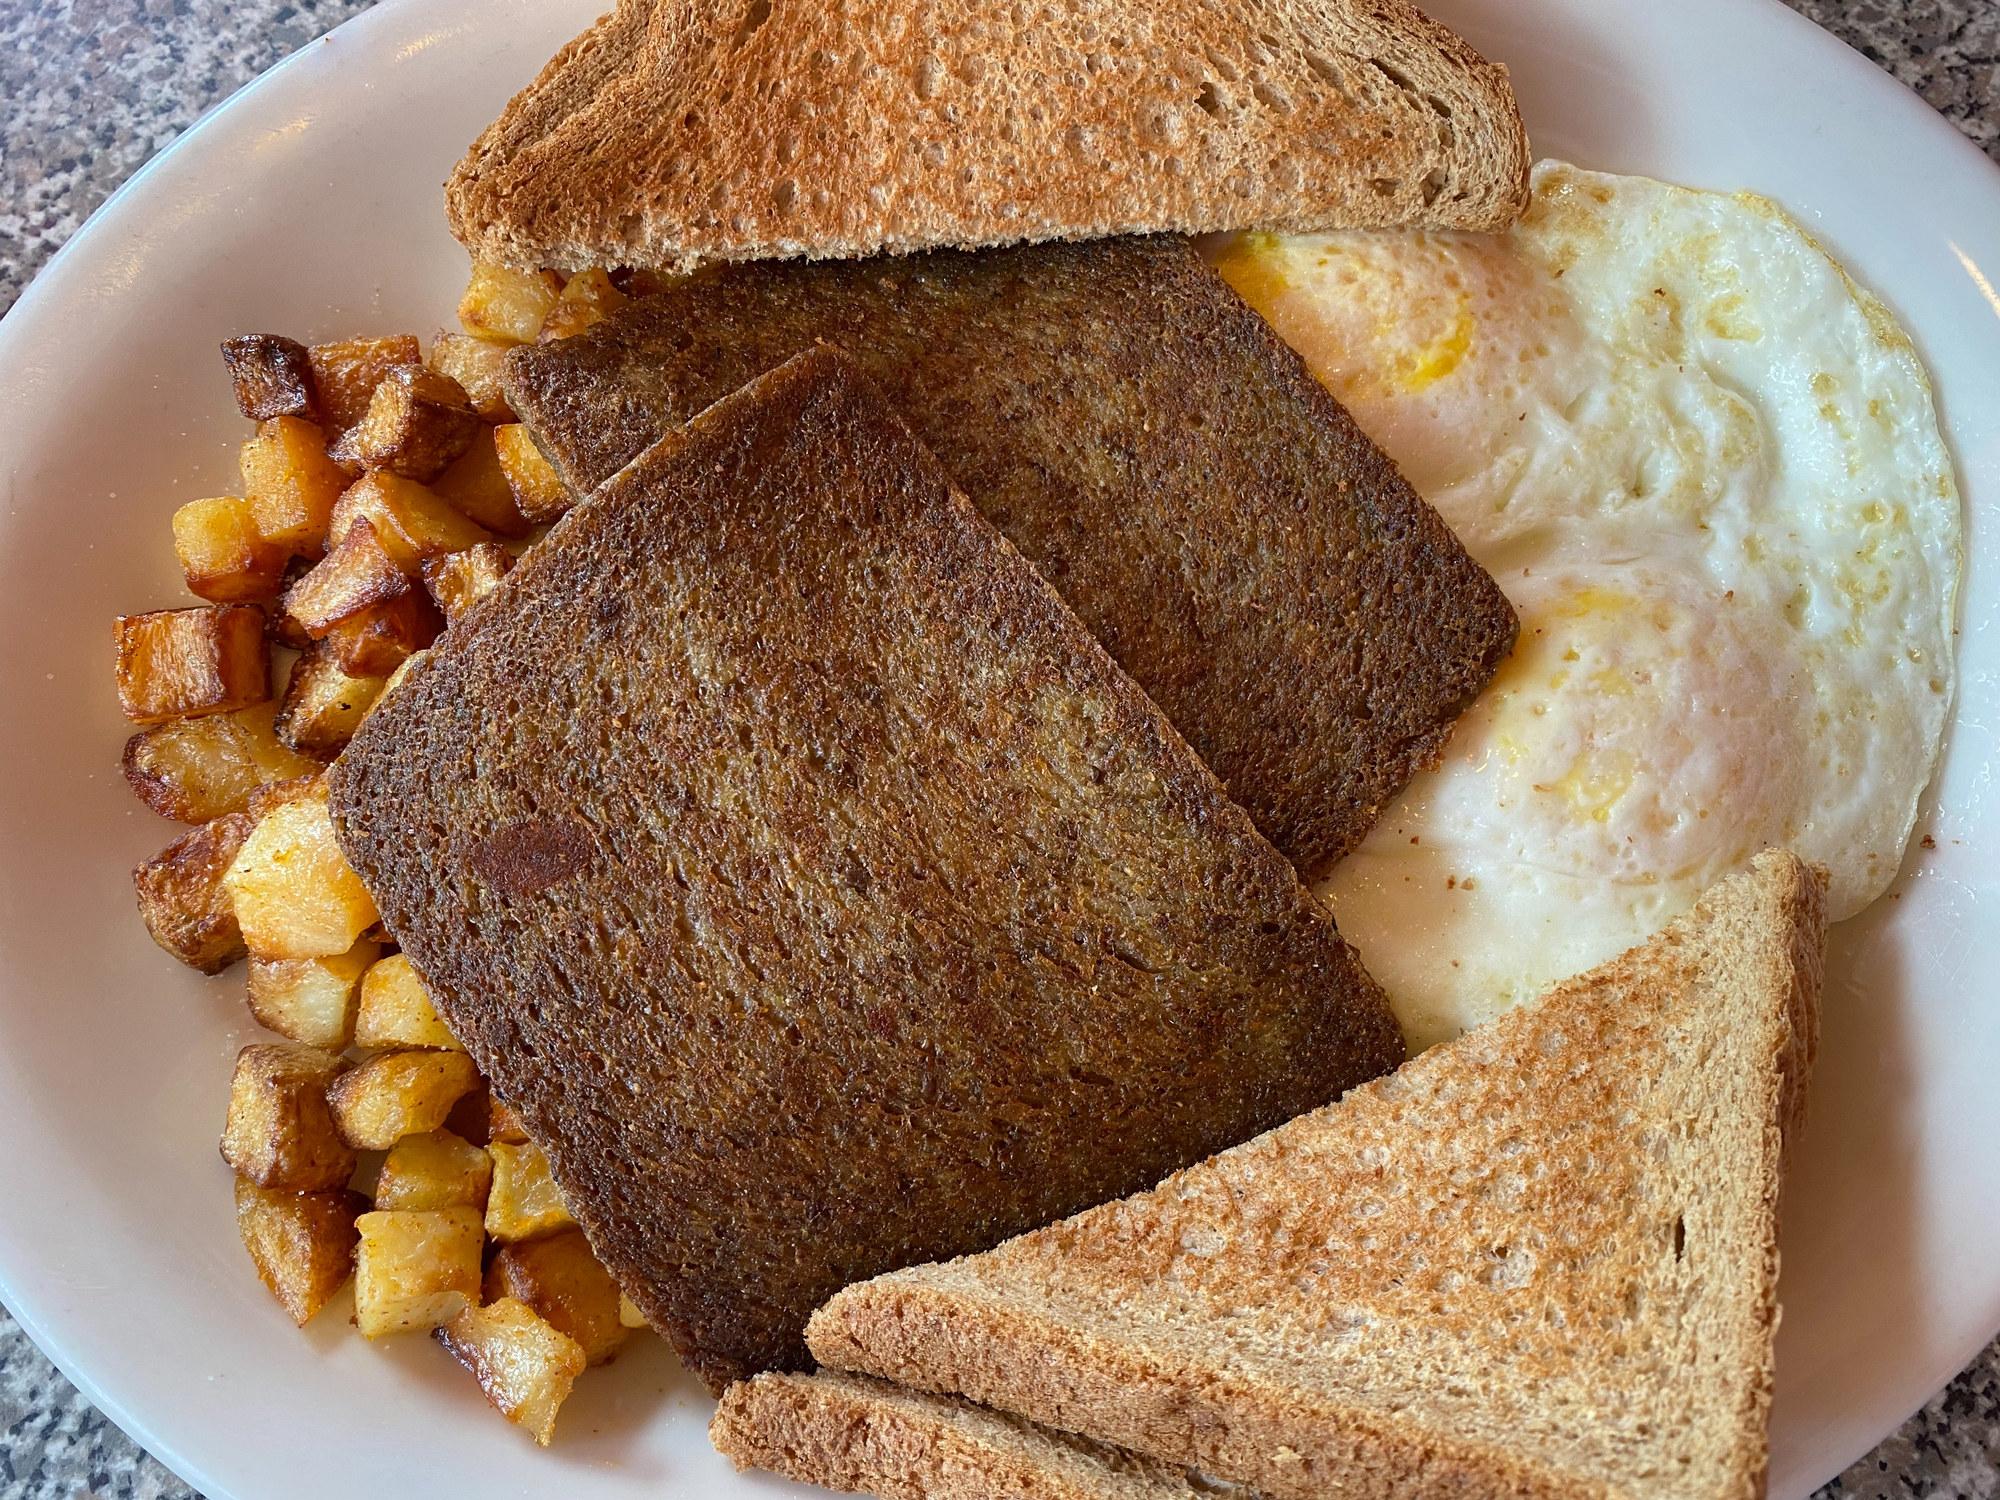 Scrapple, eggs, potatoes, and toast.